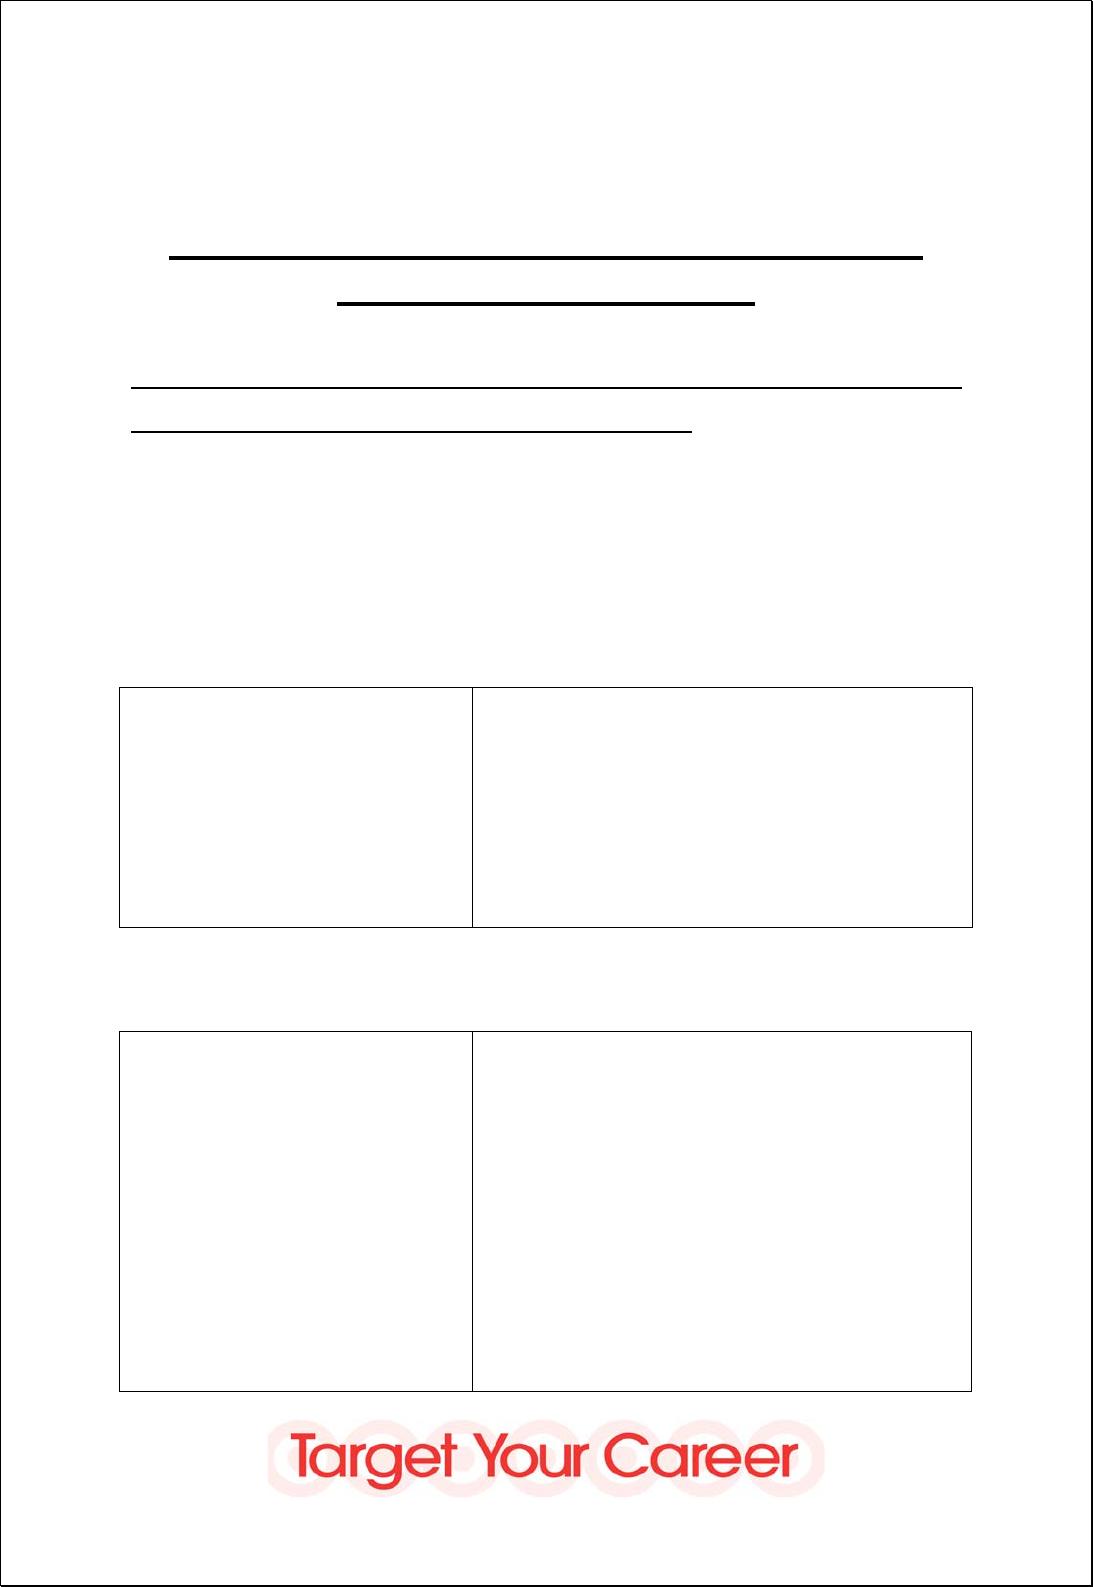 Free Printable Target Job Application Form Page 5